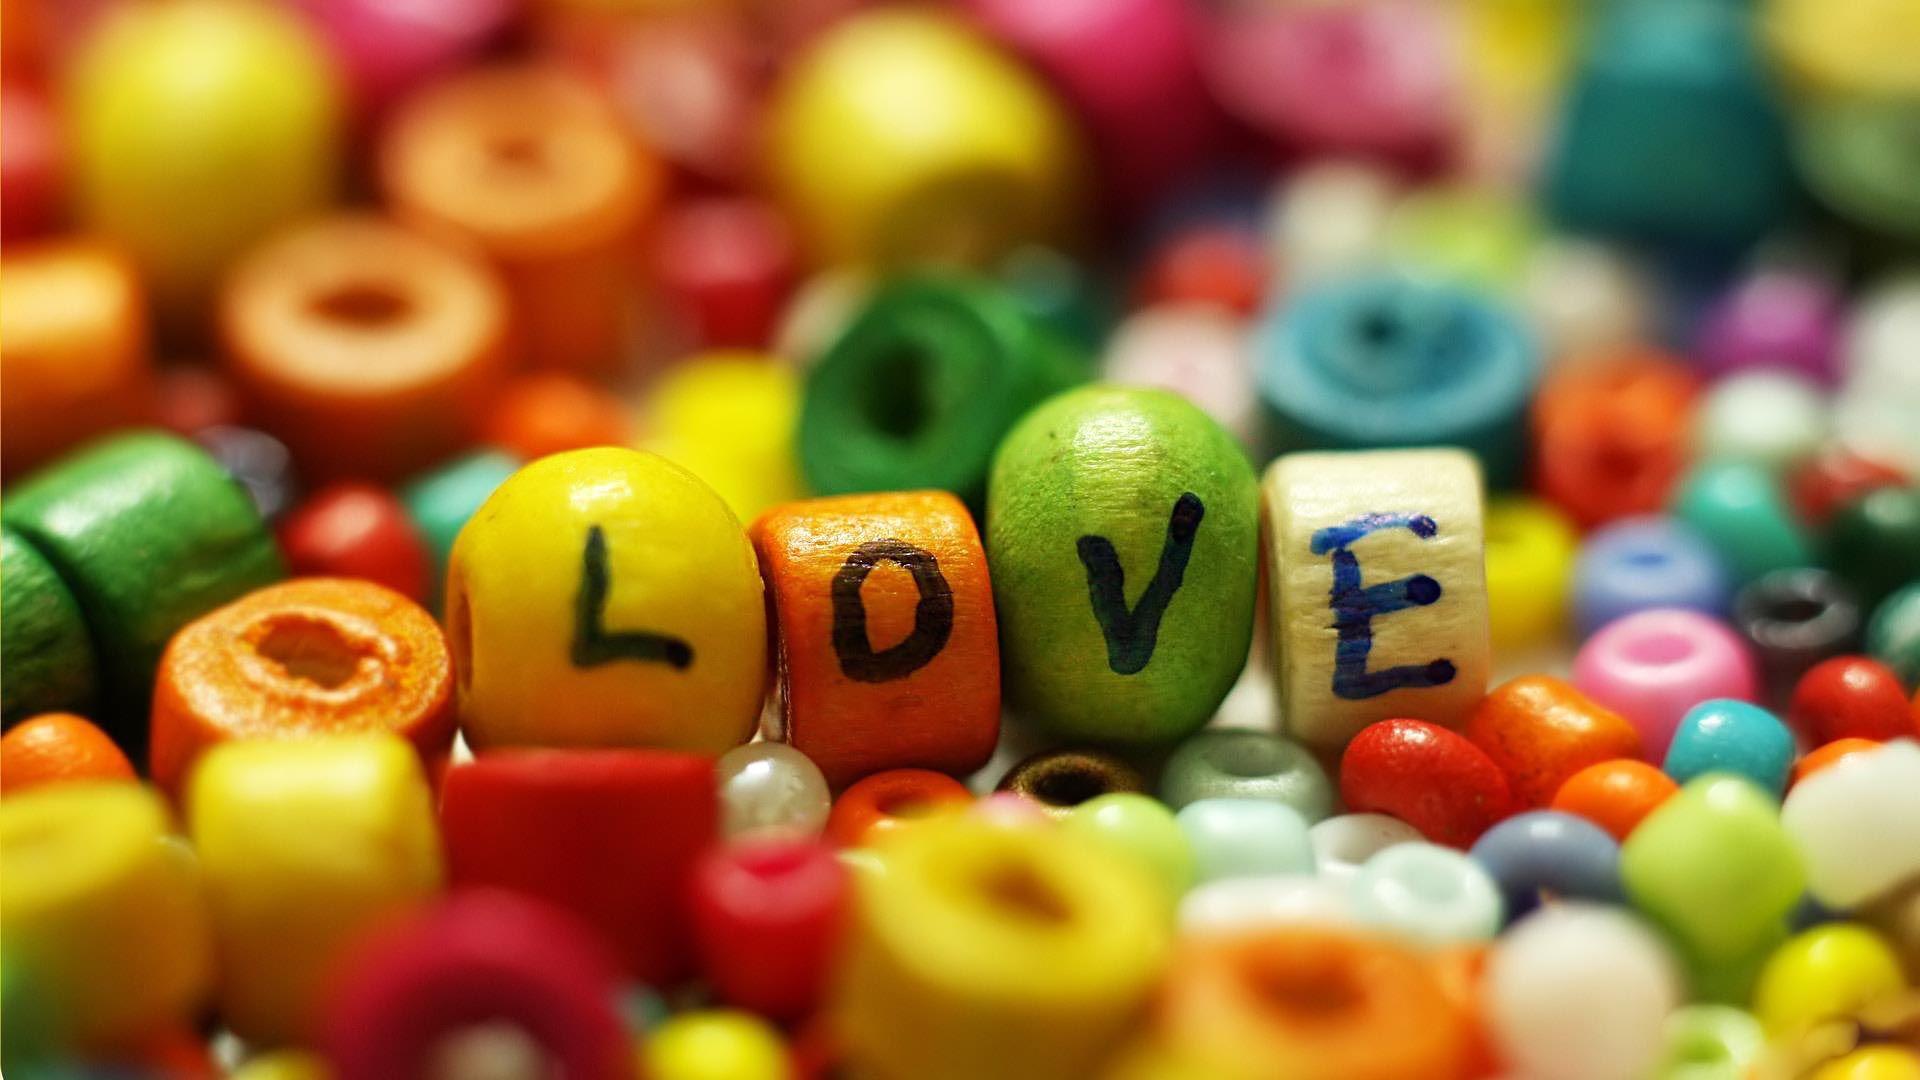 Cute Love Wallpaper Images Hd